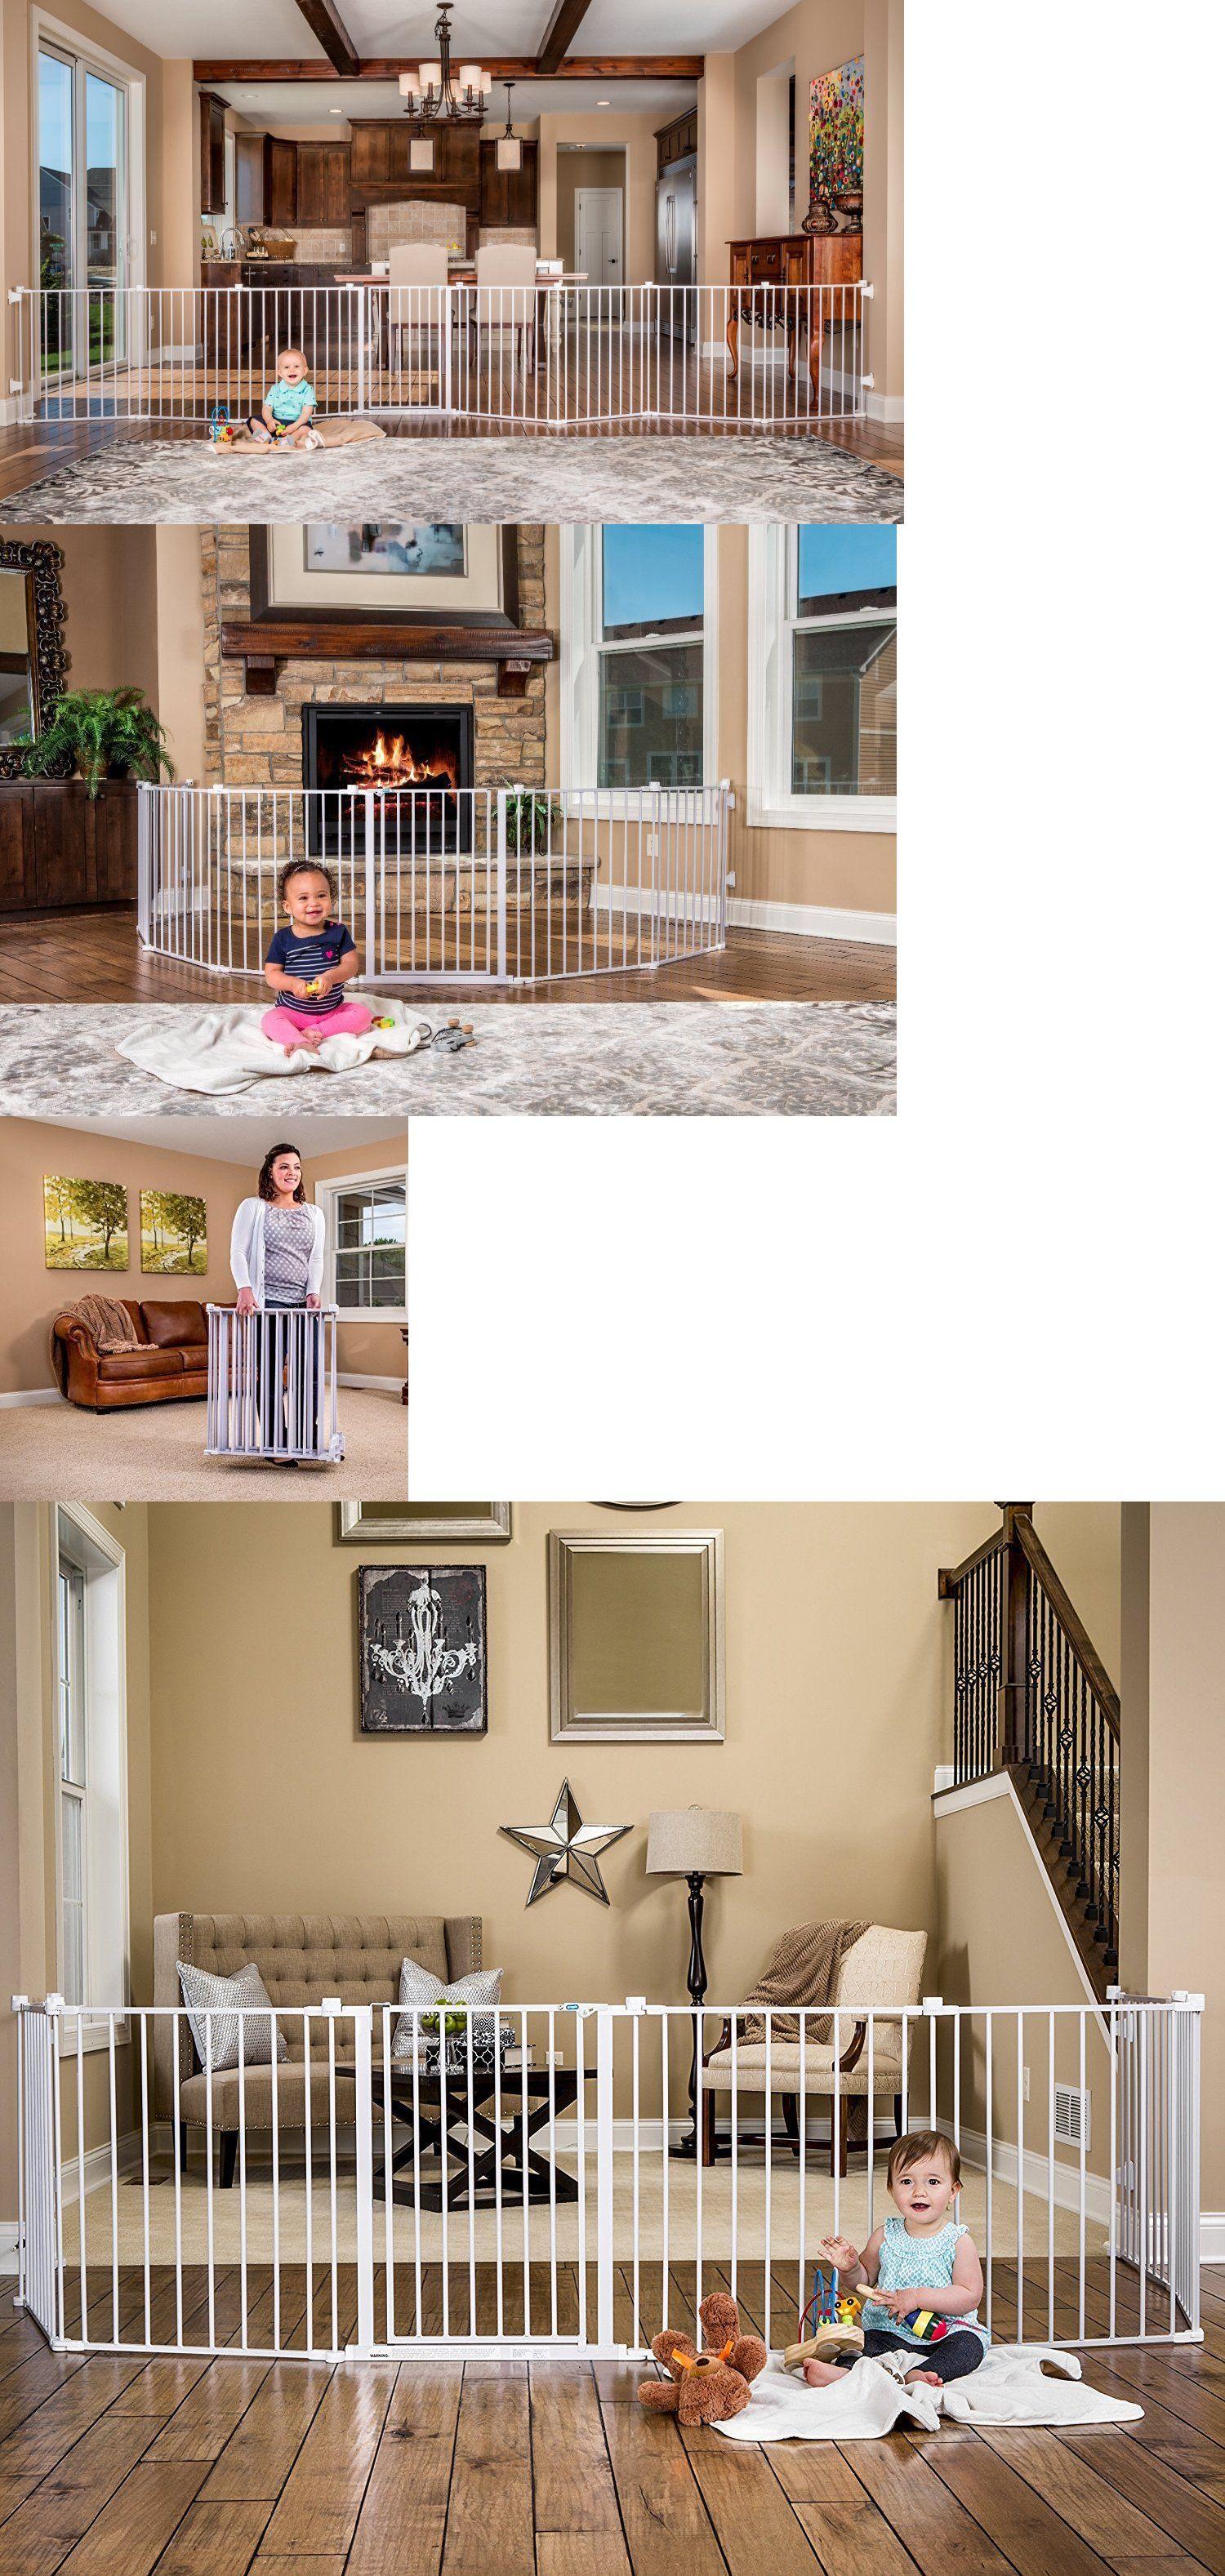 Safety Gates 117029 Baby Gate Extra Wide Long Walk Through Dog Pet